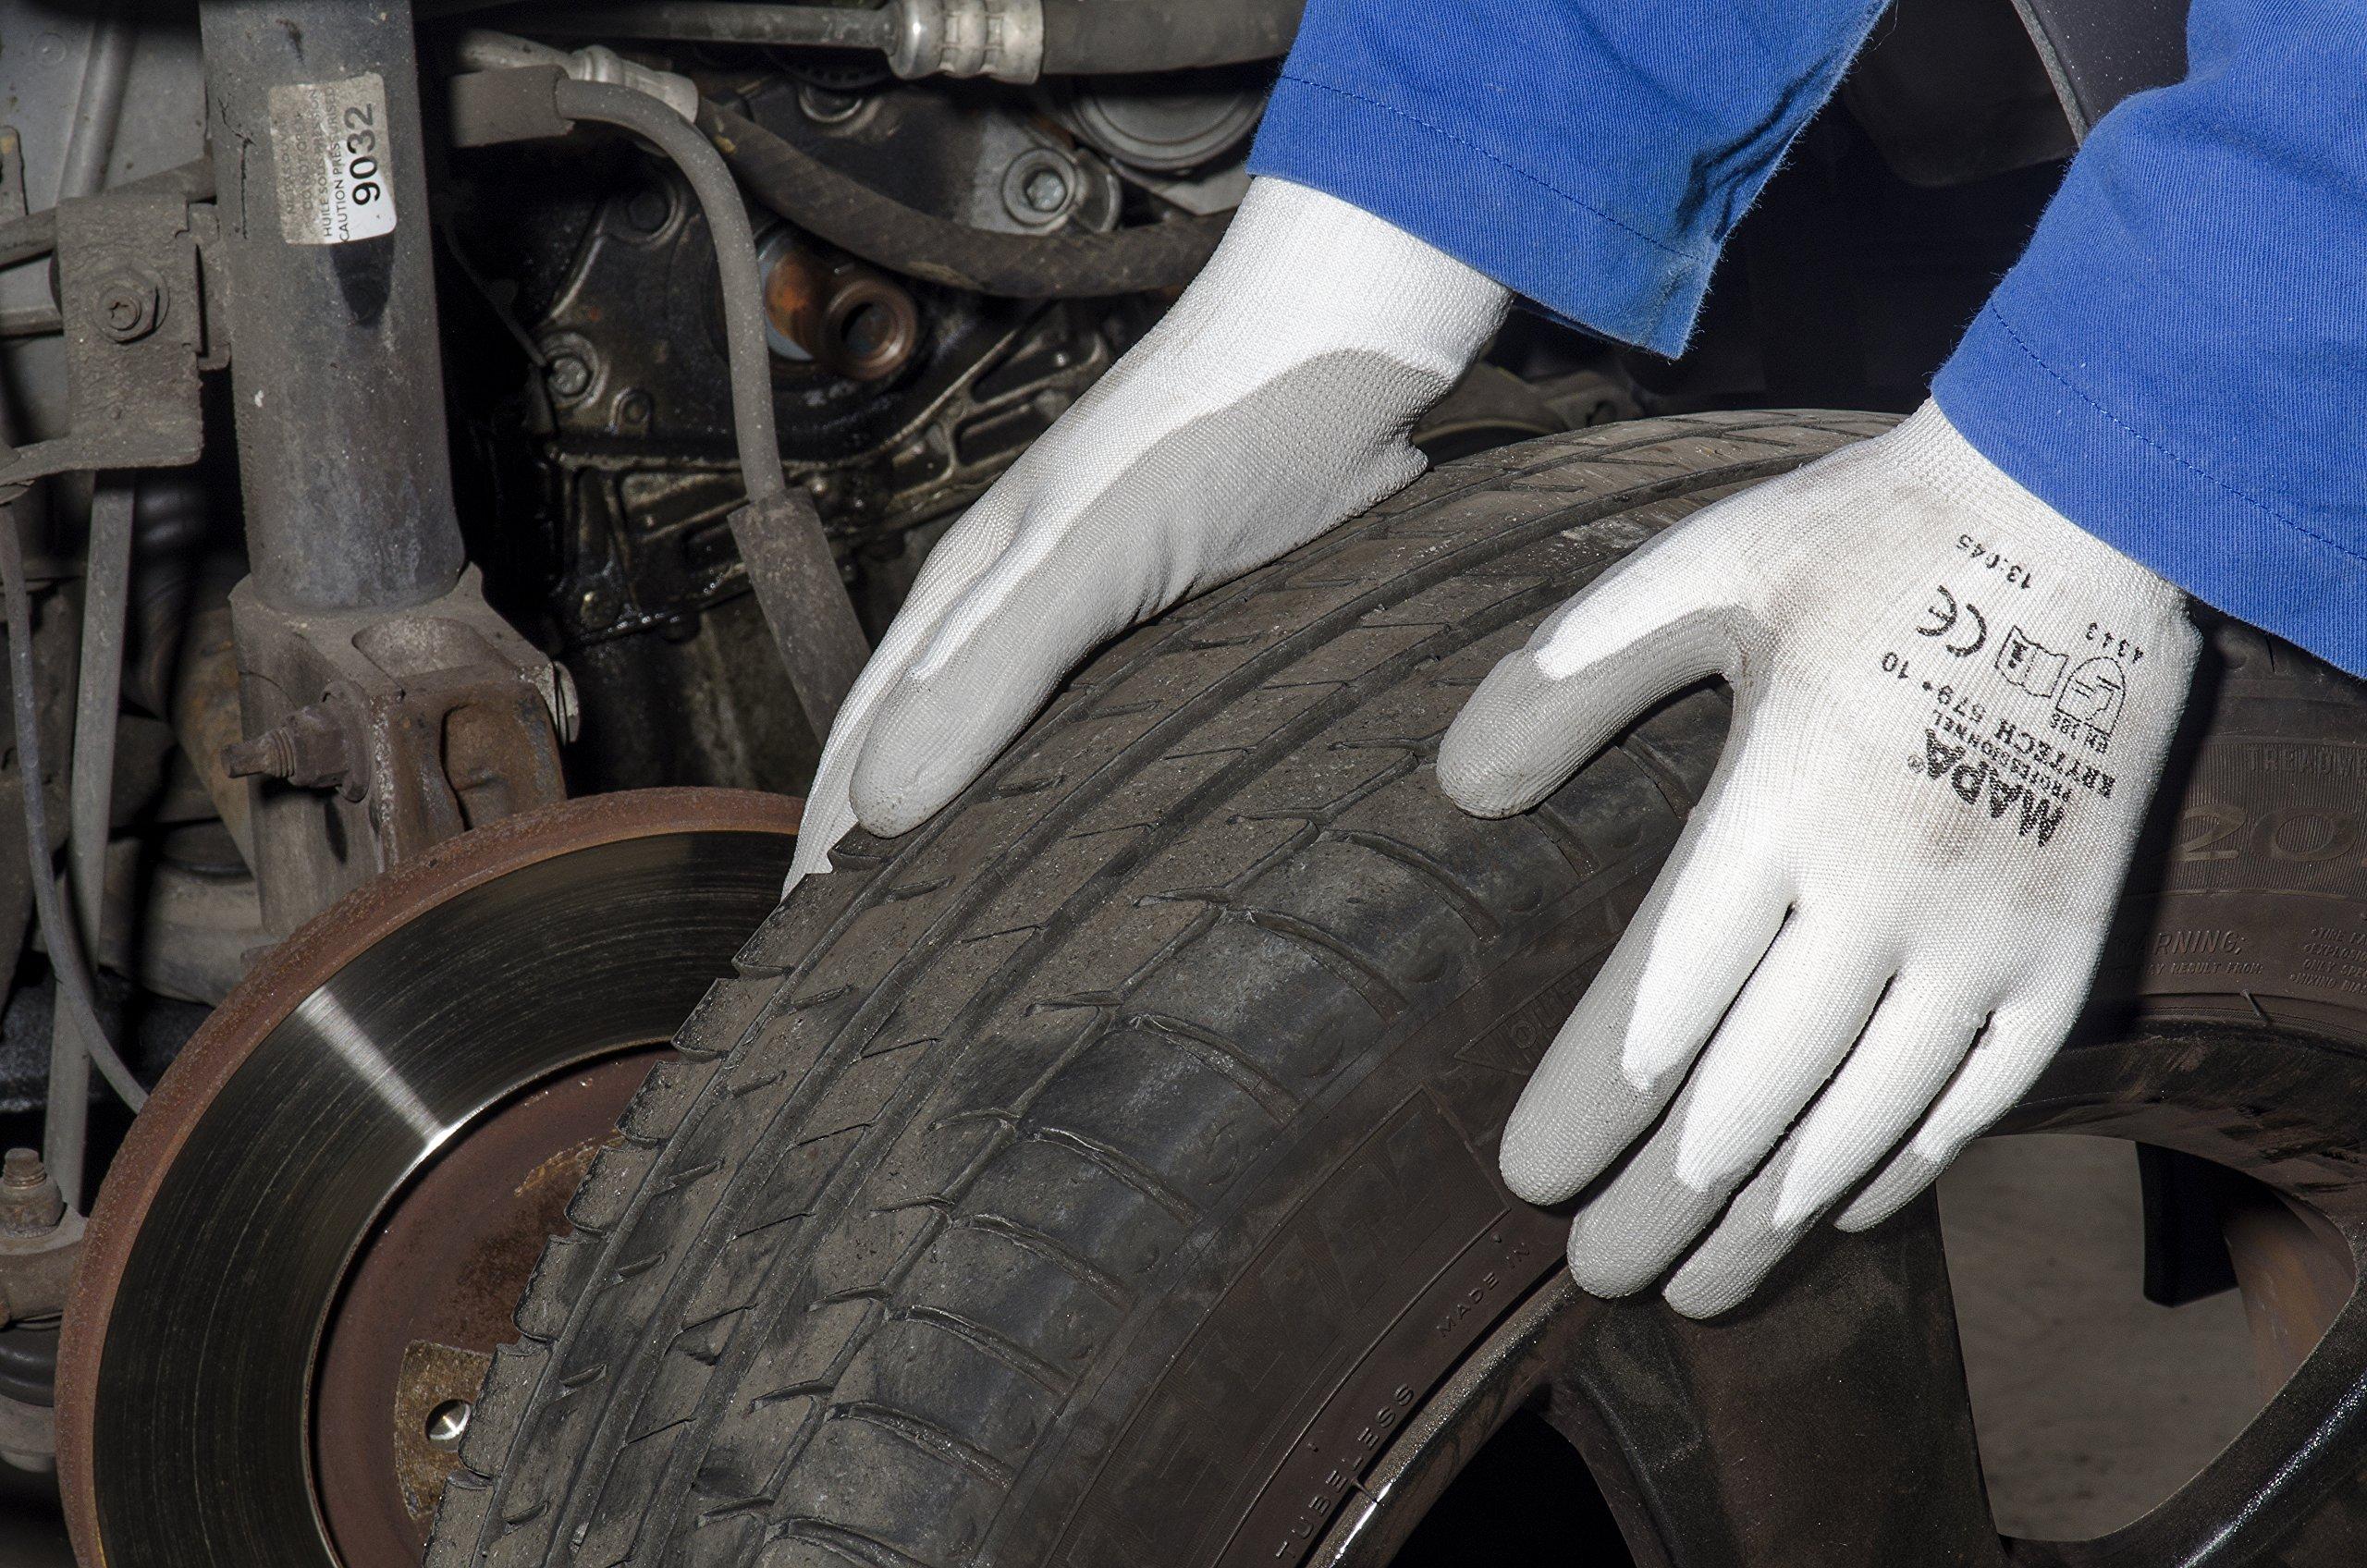 MAPA Krytech 579 Polyurethane Mediumweight Glove, Cut Resistant, 9-1/2''; Length, Size 9, White (12 Pairs)